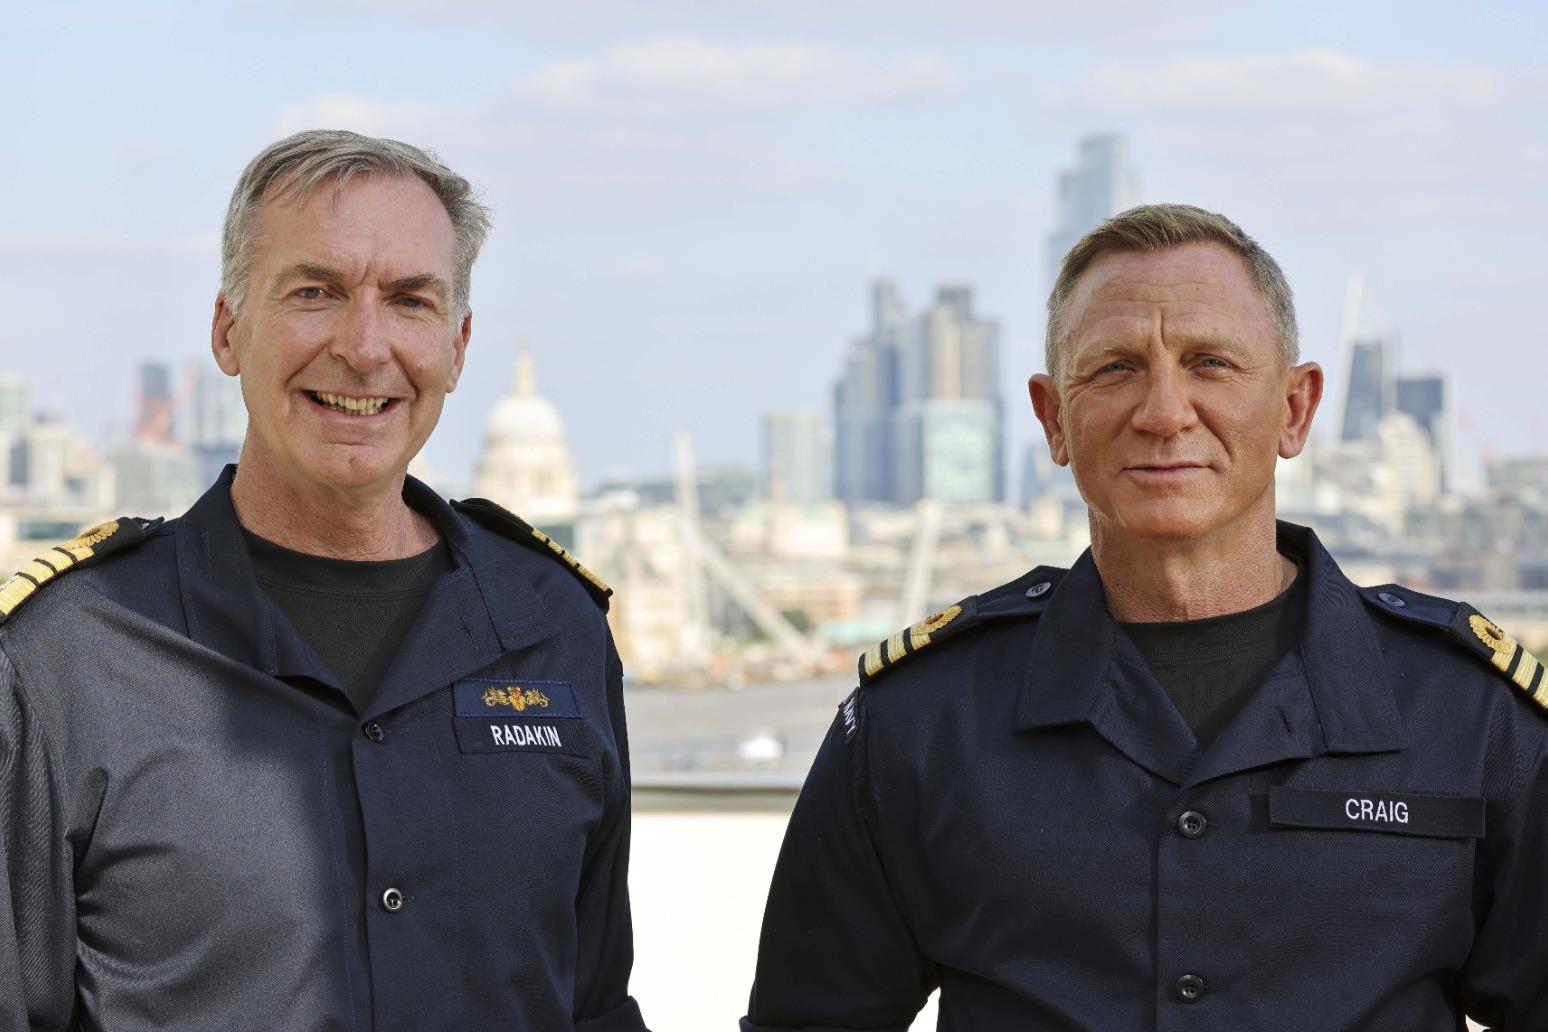 Bond, Commander Bond: Daniel Craig given honorary Royal Navy rank